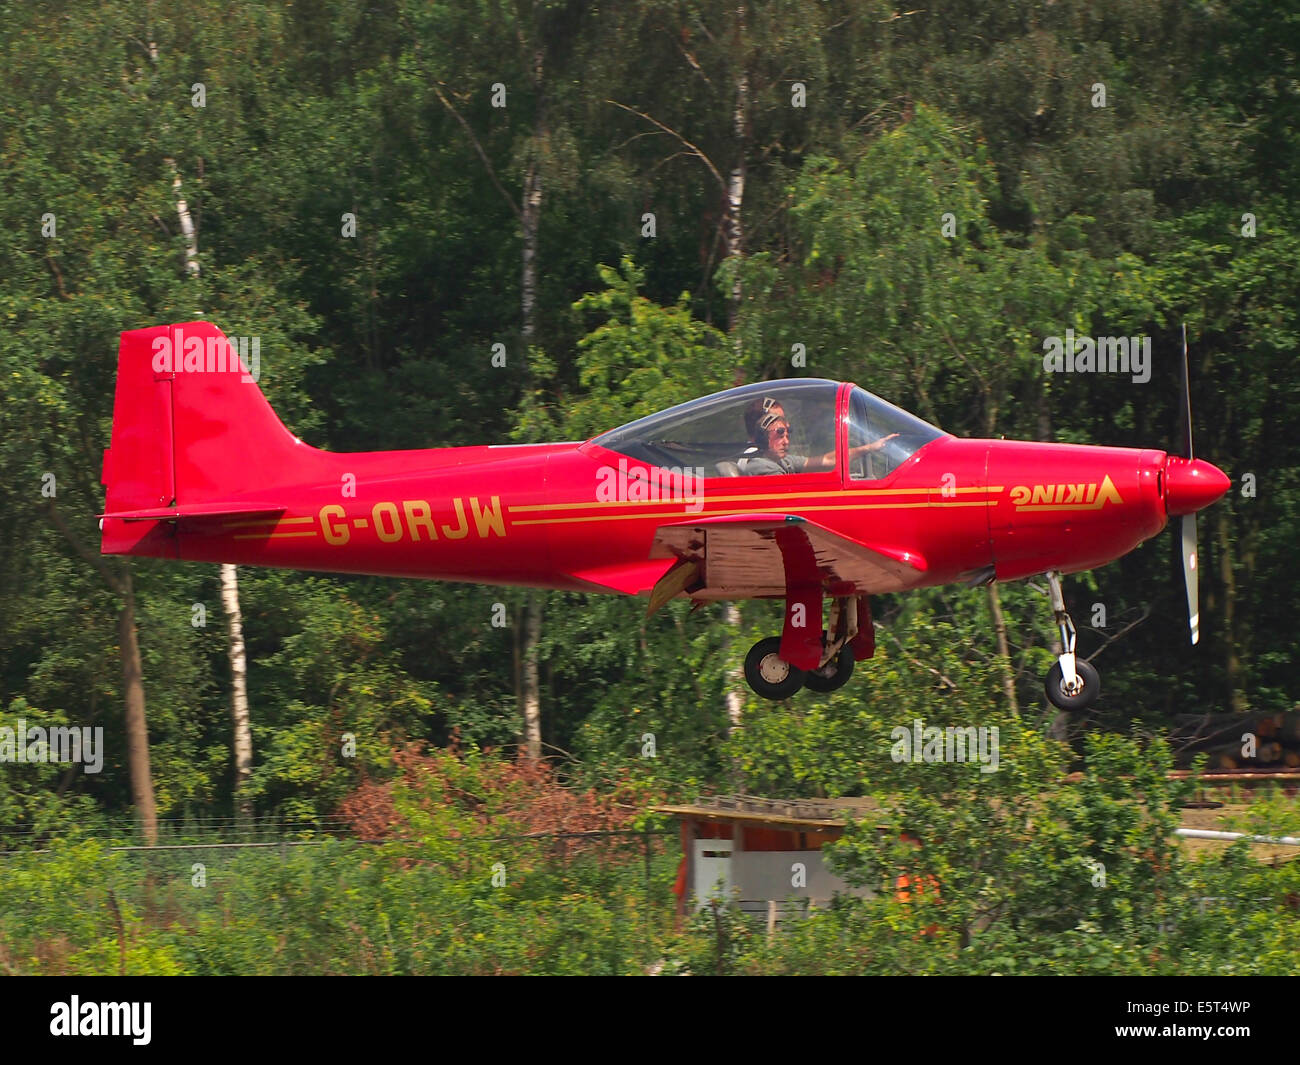 G-ORJW Laverda F8L Falco IV , landing at Hilversum Airport (ICAO EHHV), photo3 - Stock Image